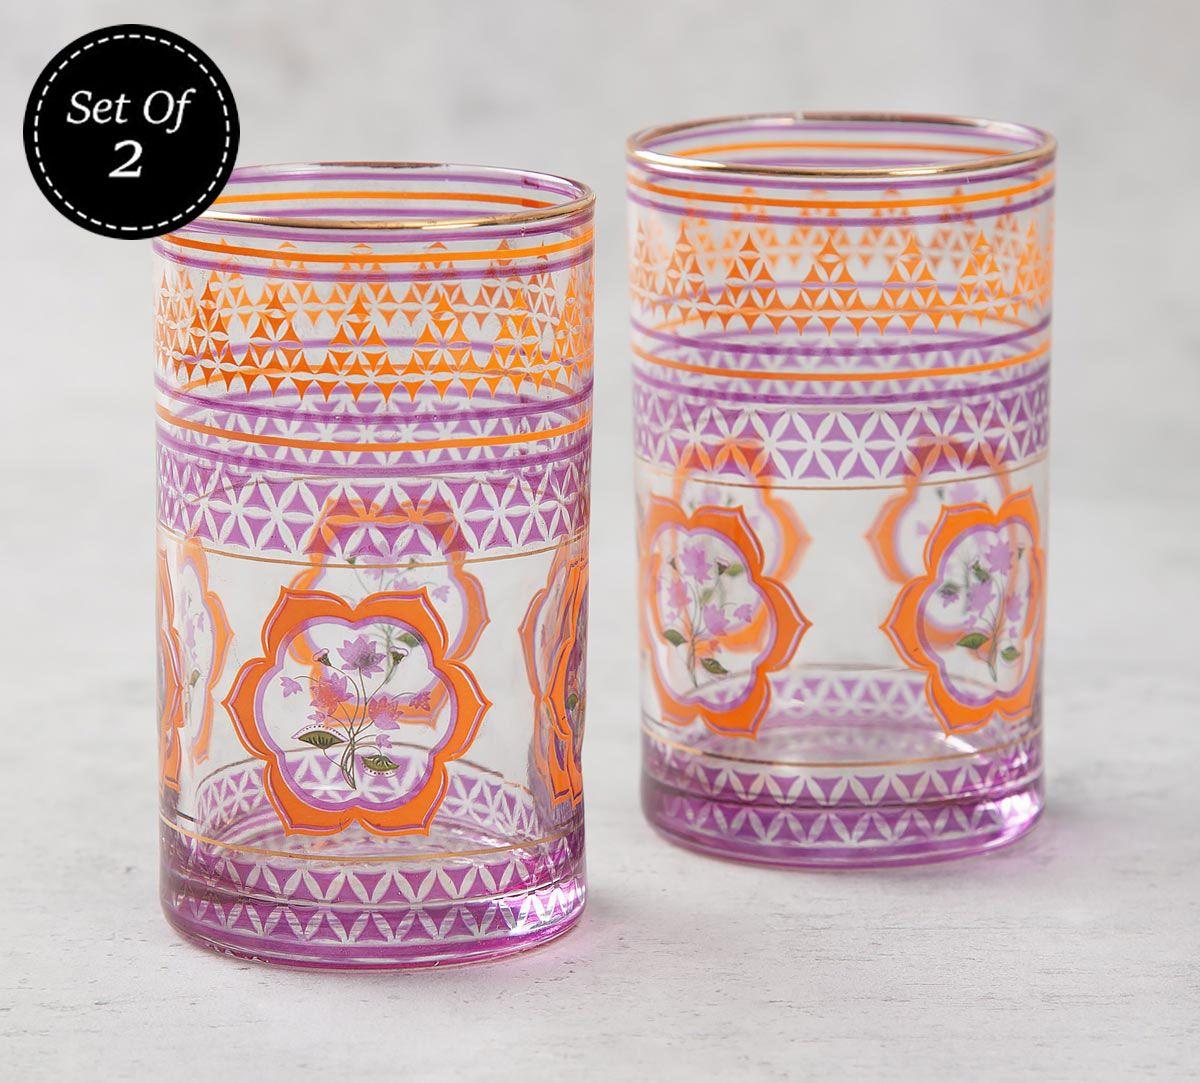 India Circus Lattice Lotus Small Glass Tumbler (Set of 2)